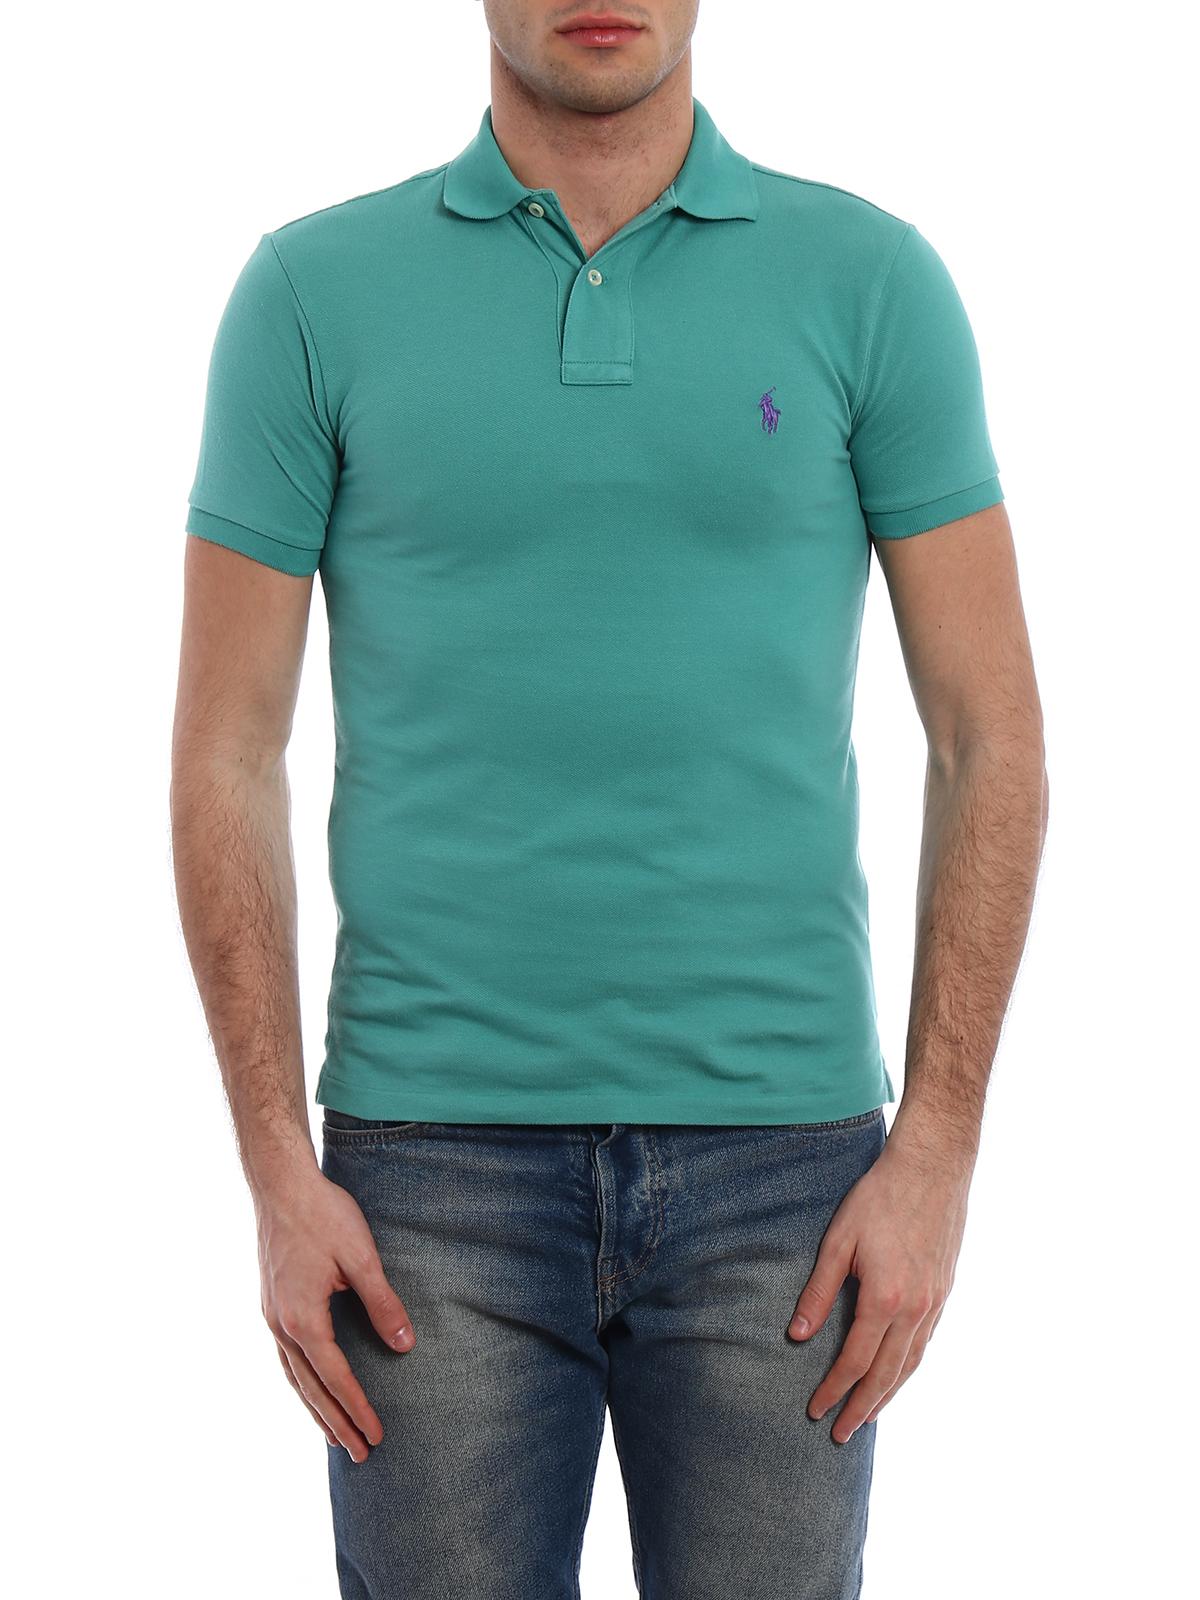 Polo Ralph Lauren - Purple logo classic polo shirt - polo shirts ...